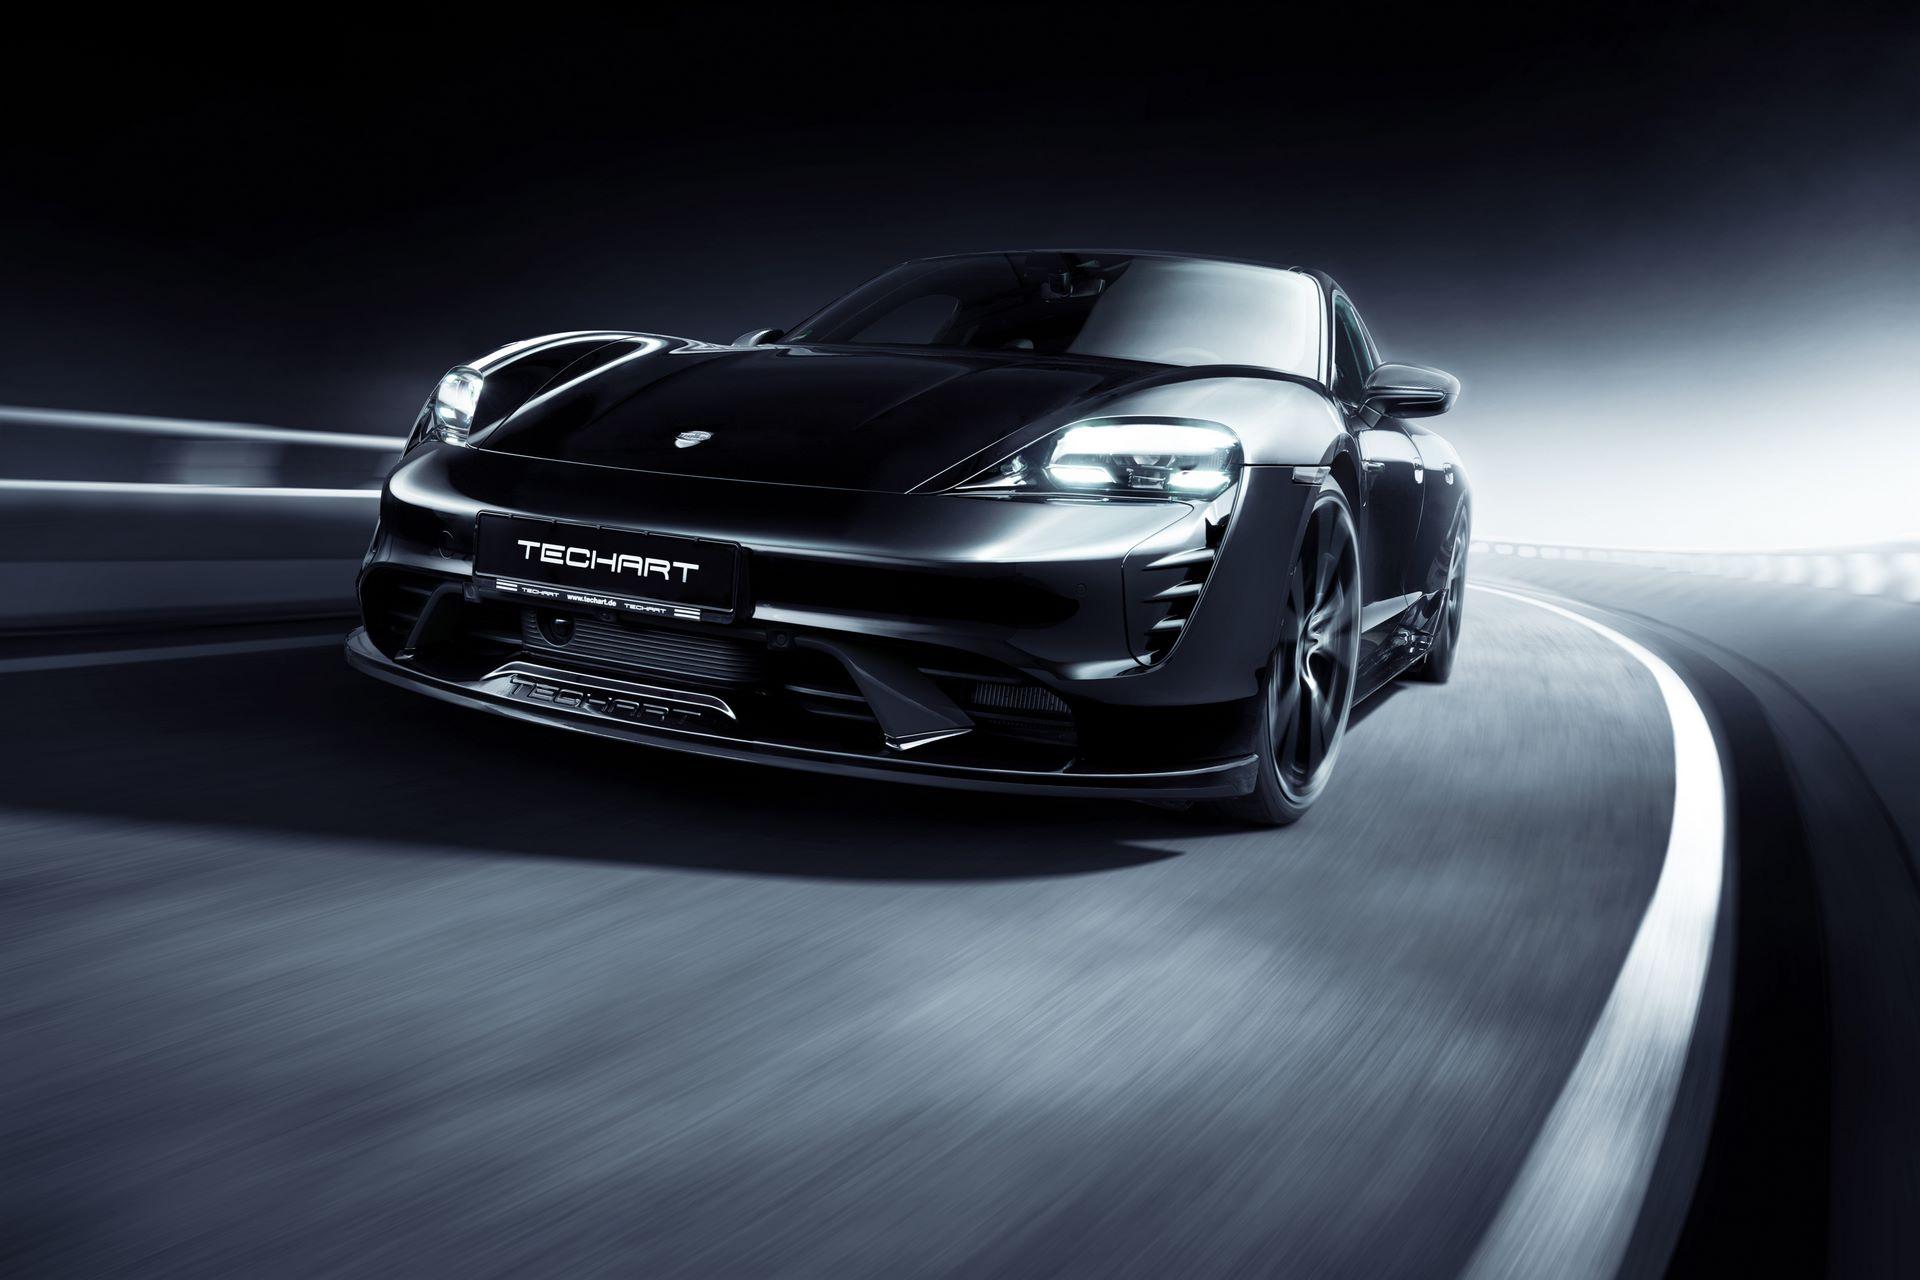 Porsche-Taycan-bodykit-by-TechArt-11